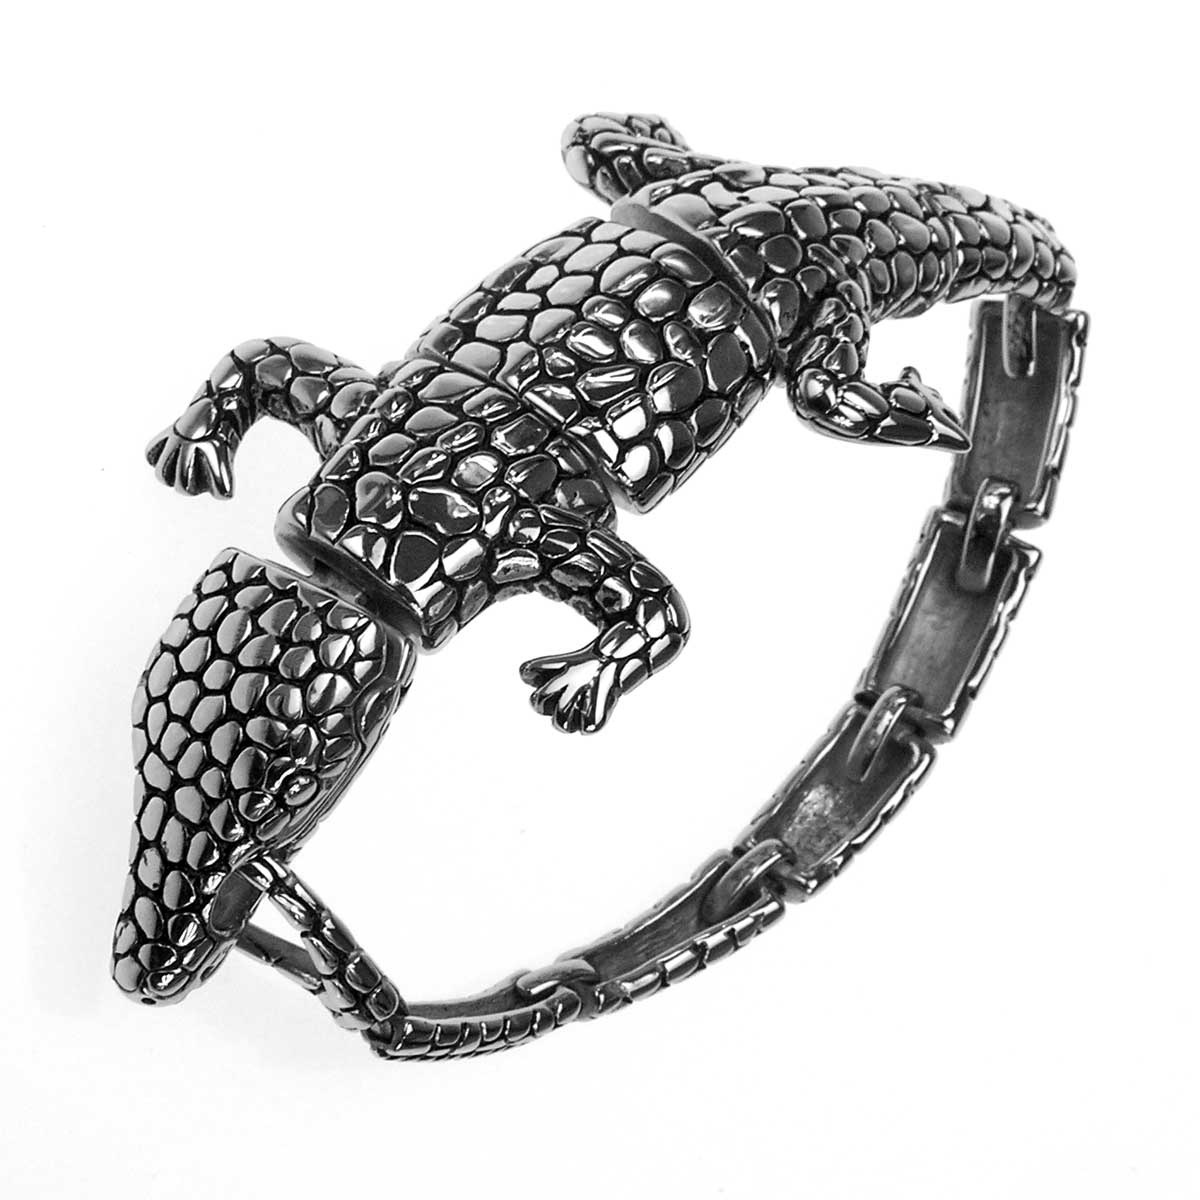 Edelstahl Armband als Krokodil, sehr schön!